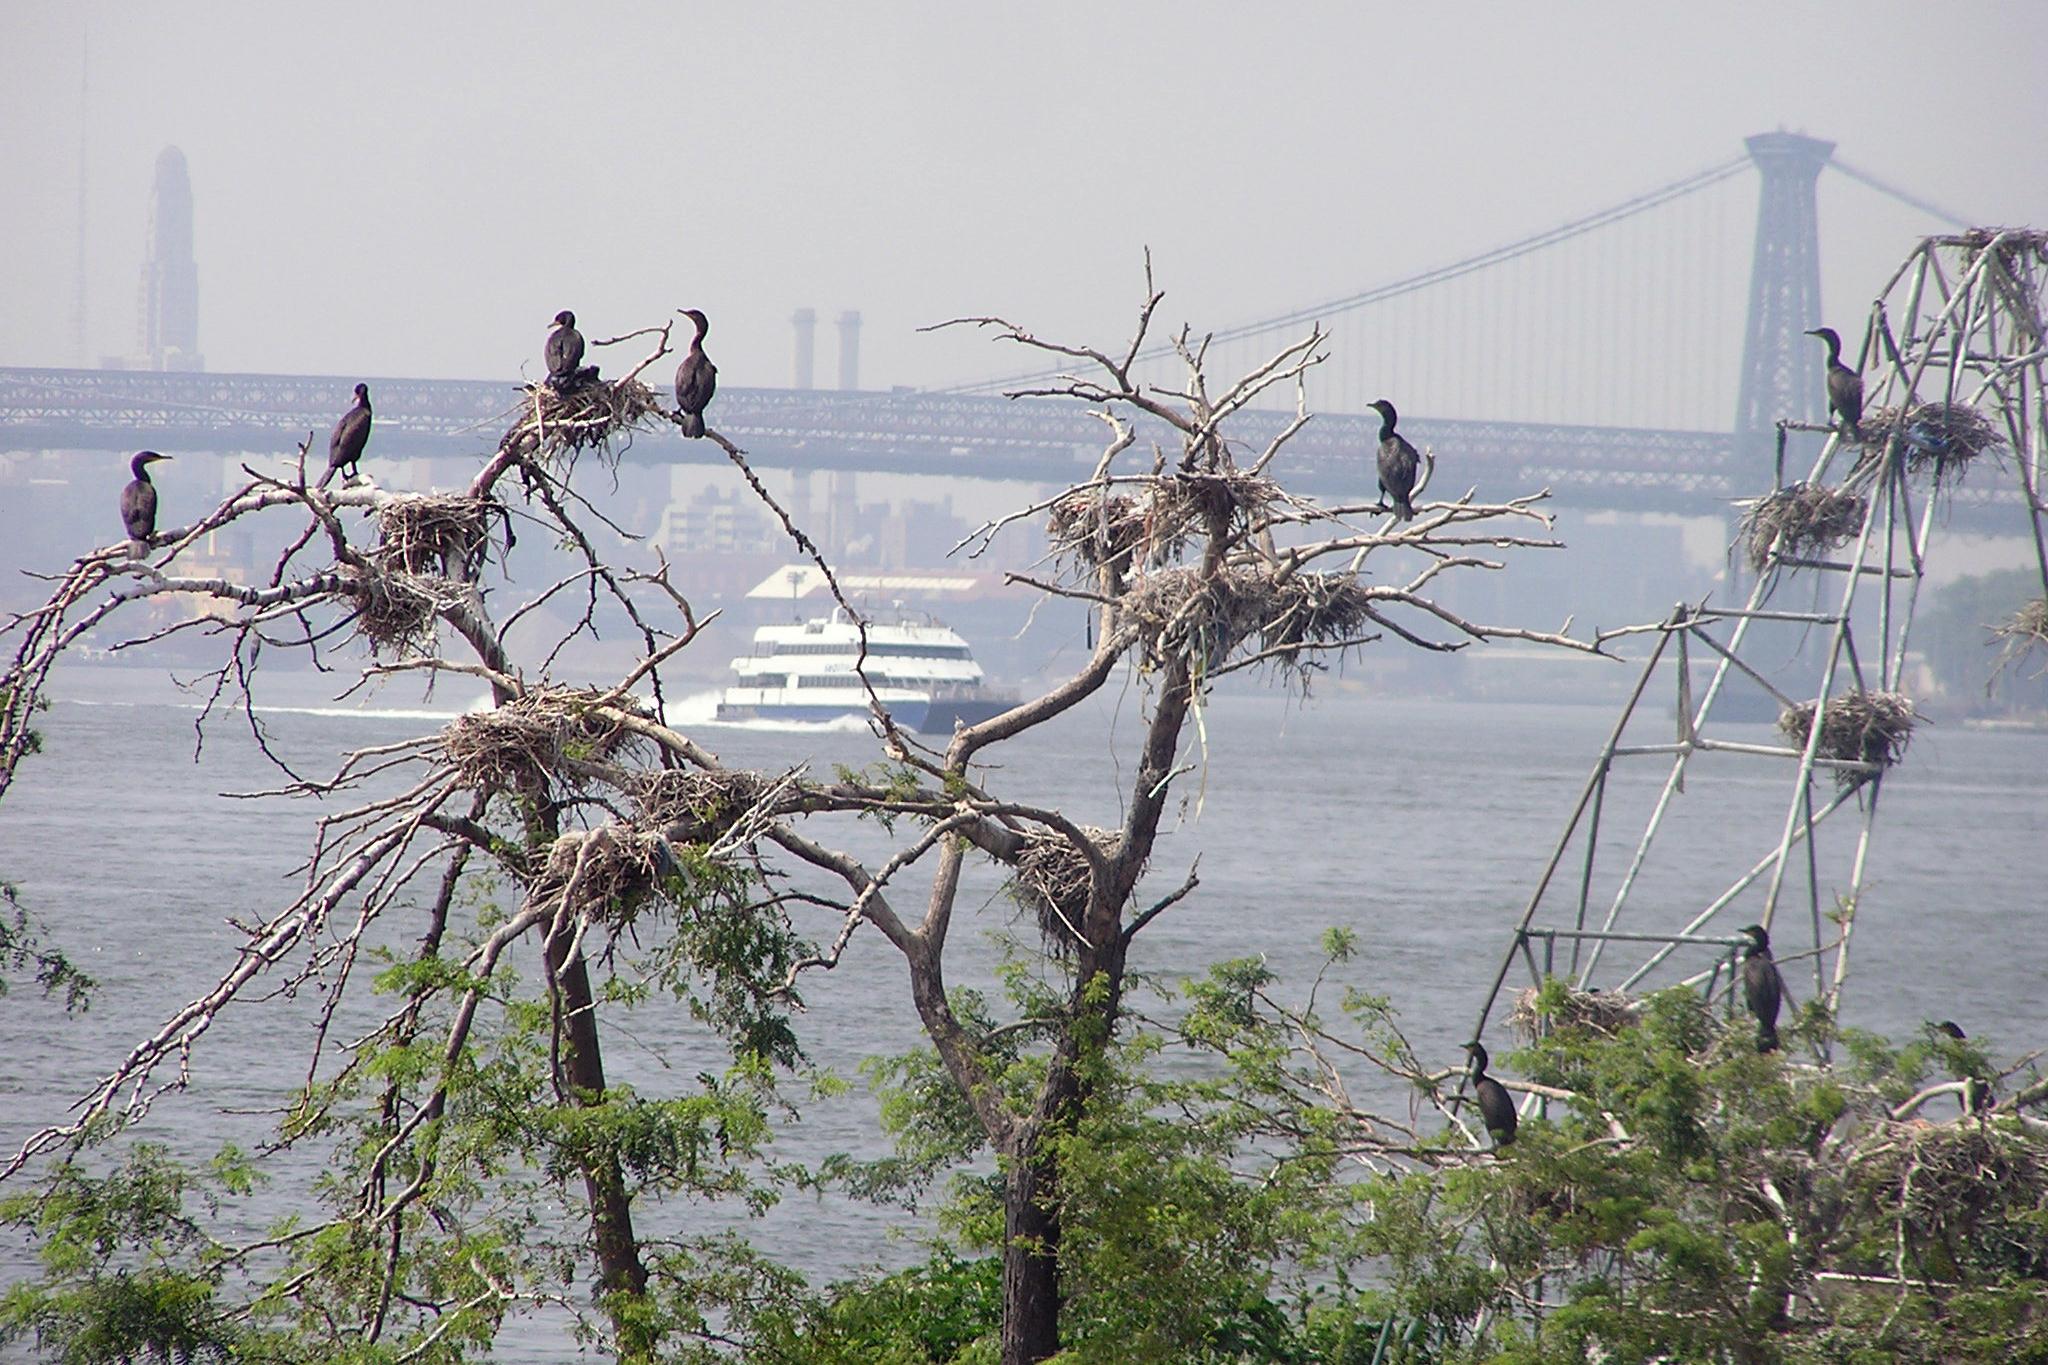 Meet your avian neighbors with NYC Audubon